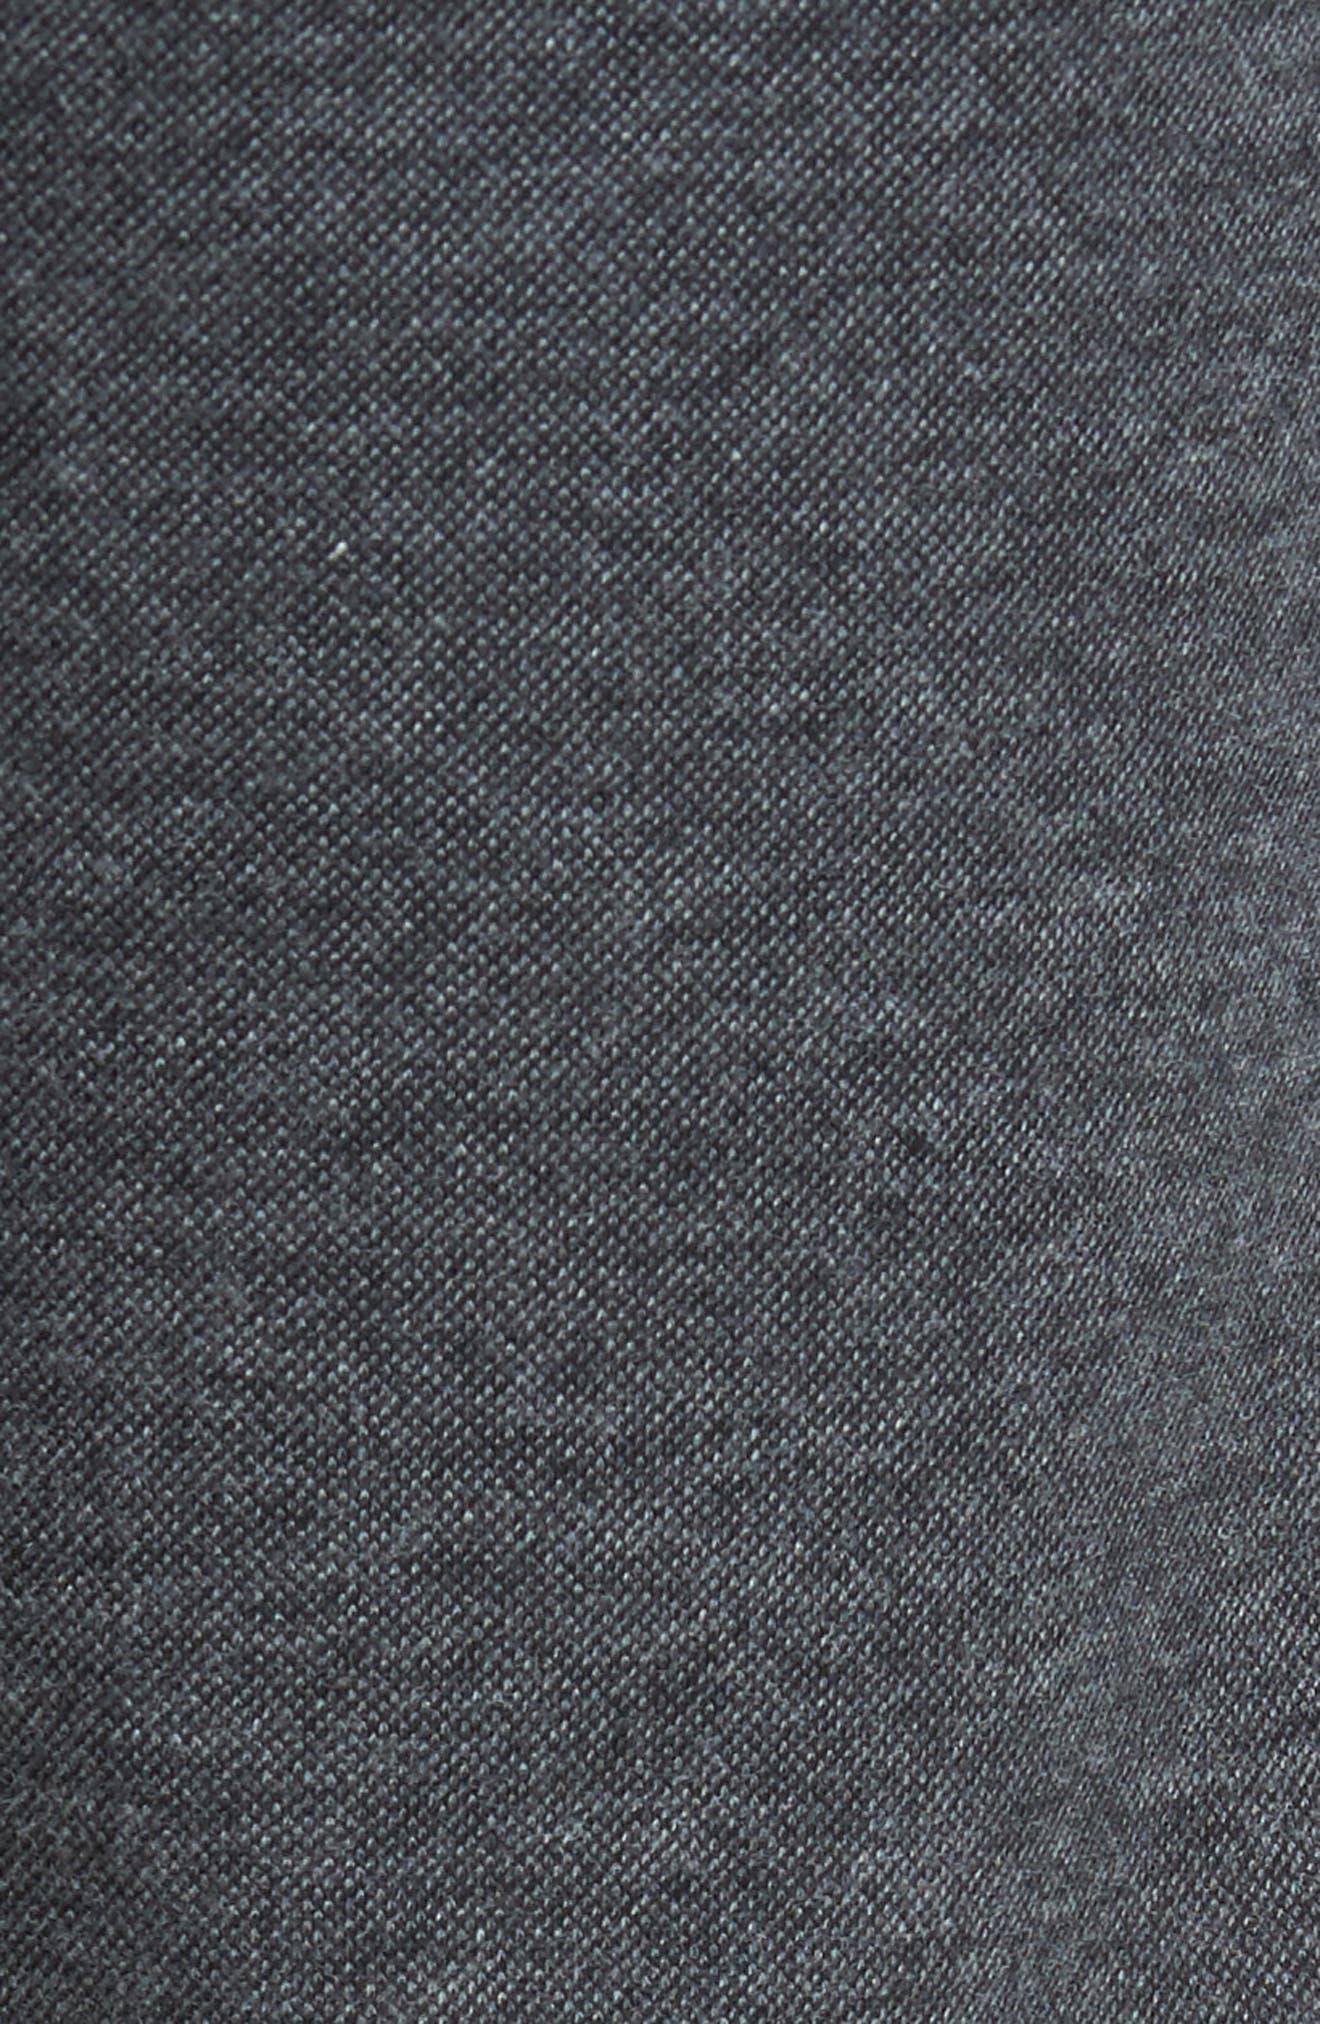 Jordan Flat Front Cotton Jogger Trousers,                             Alternate thumbnail 5, color,                             Medium Grey